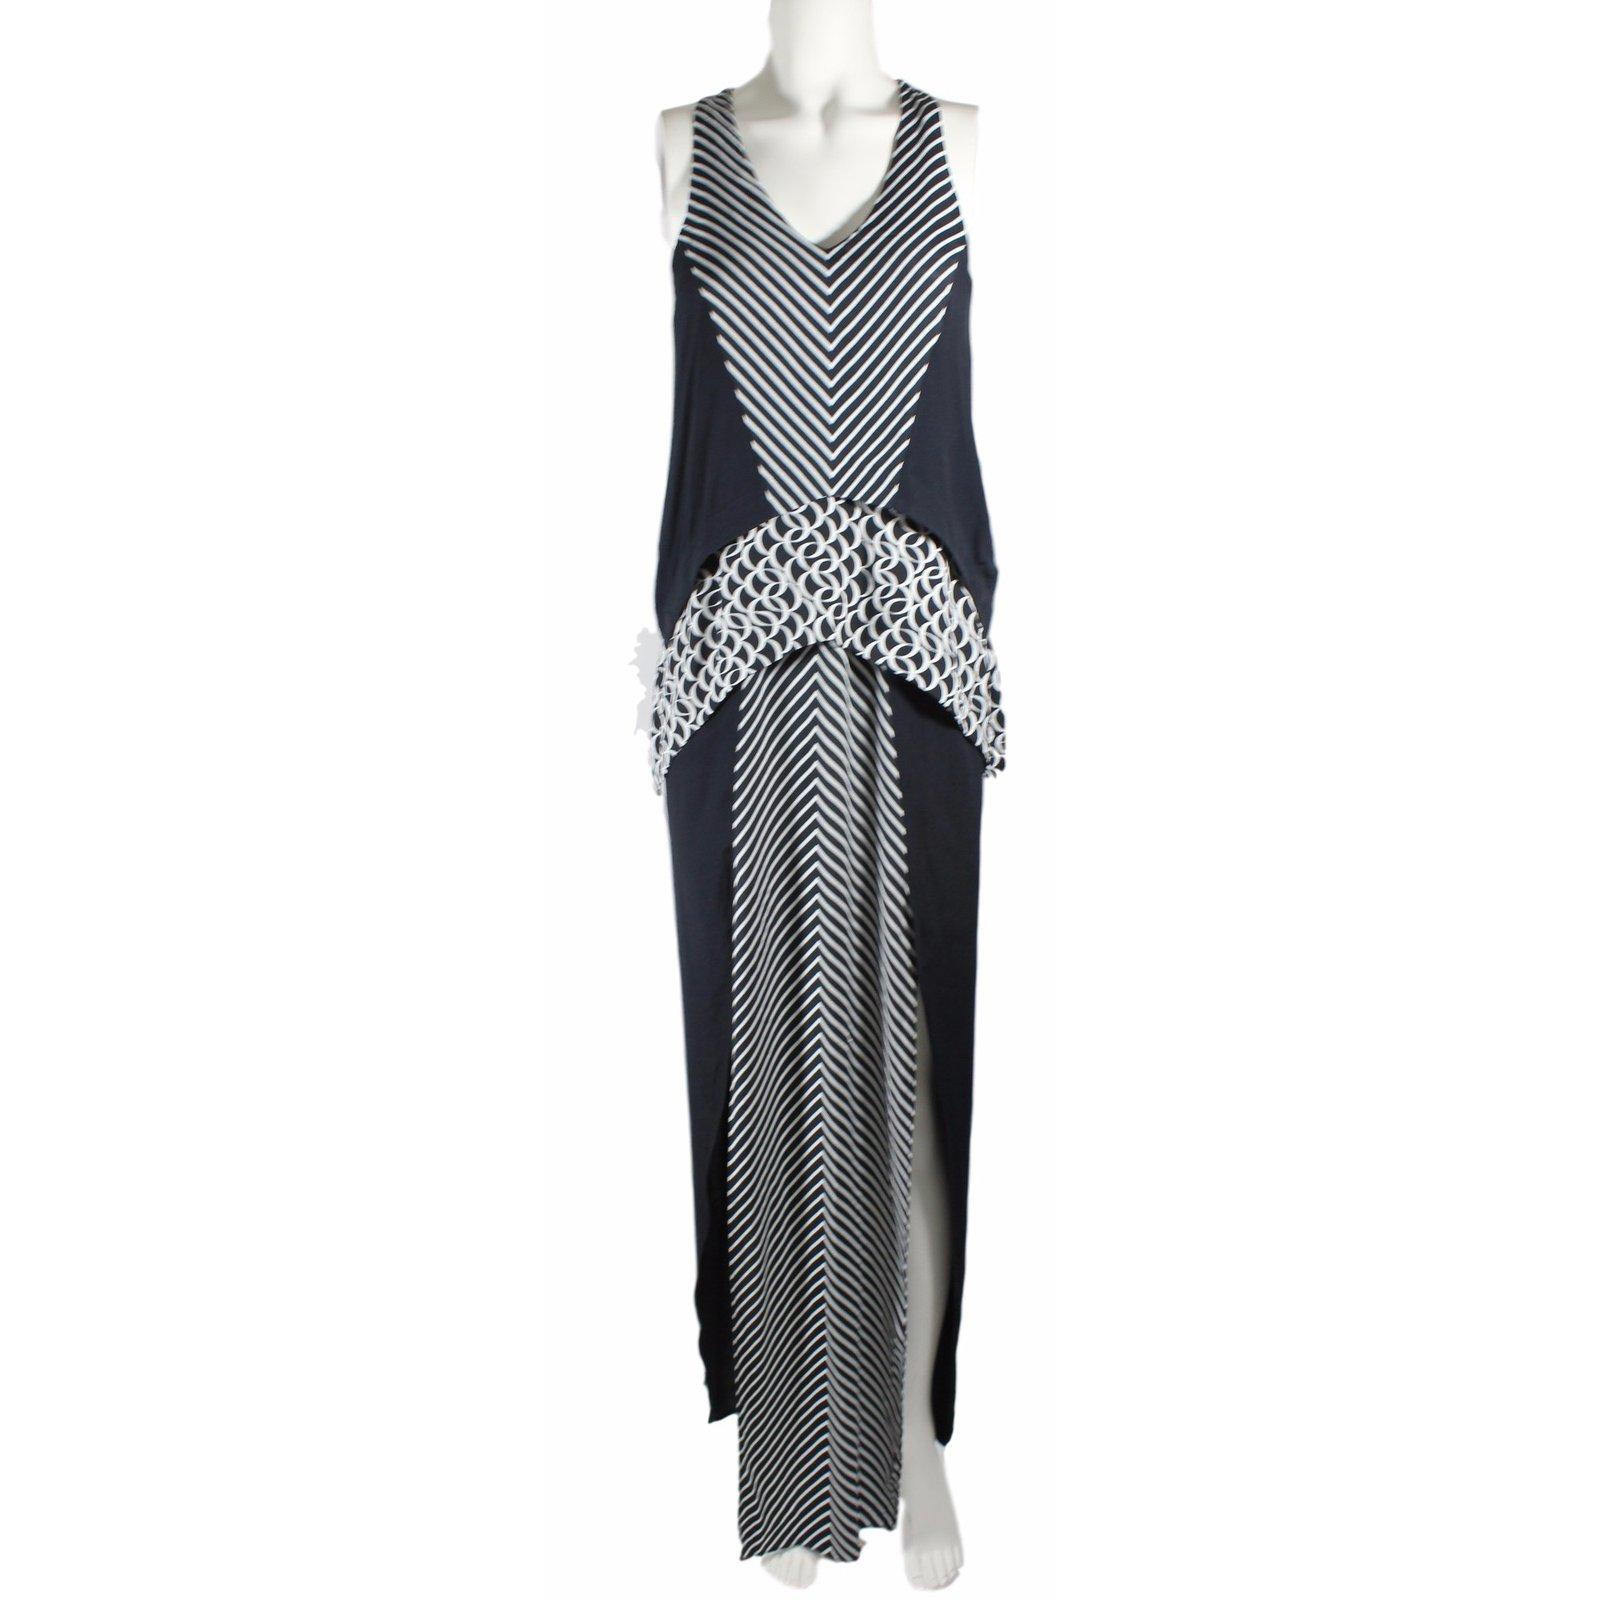 Sass Bide Walk Strong Dress Dresses Rayon Black White Ref 18697 Joli Closet